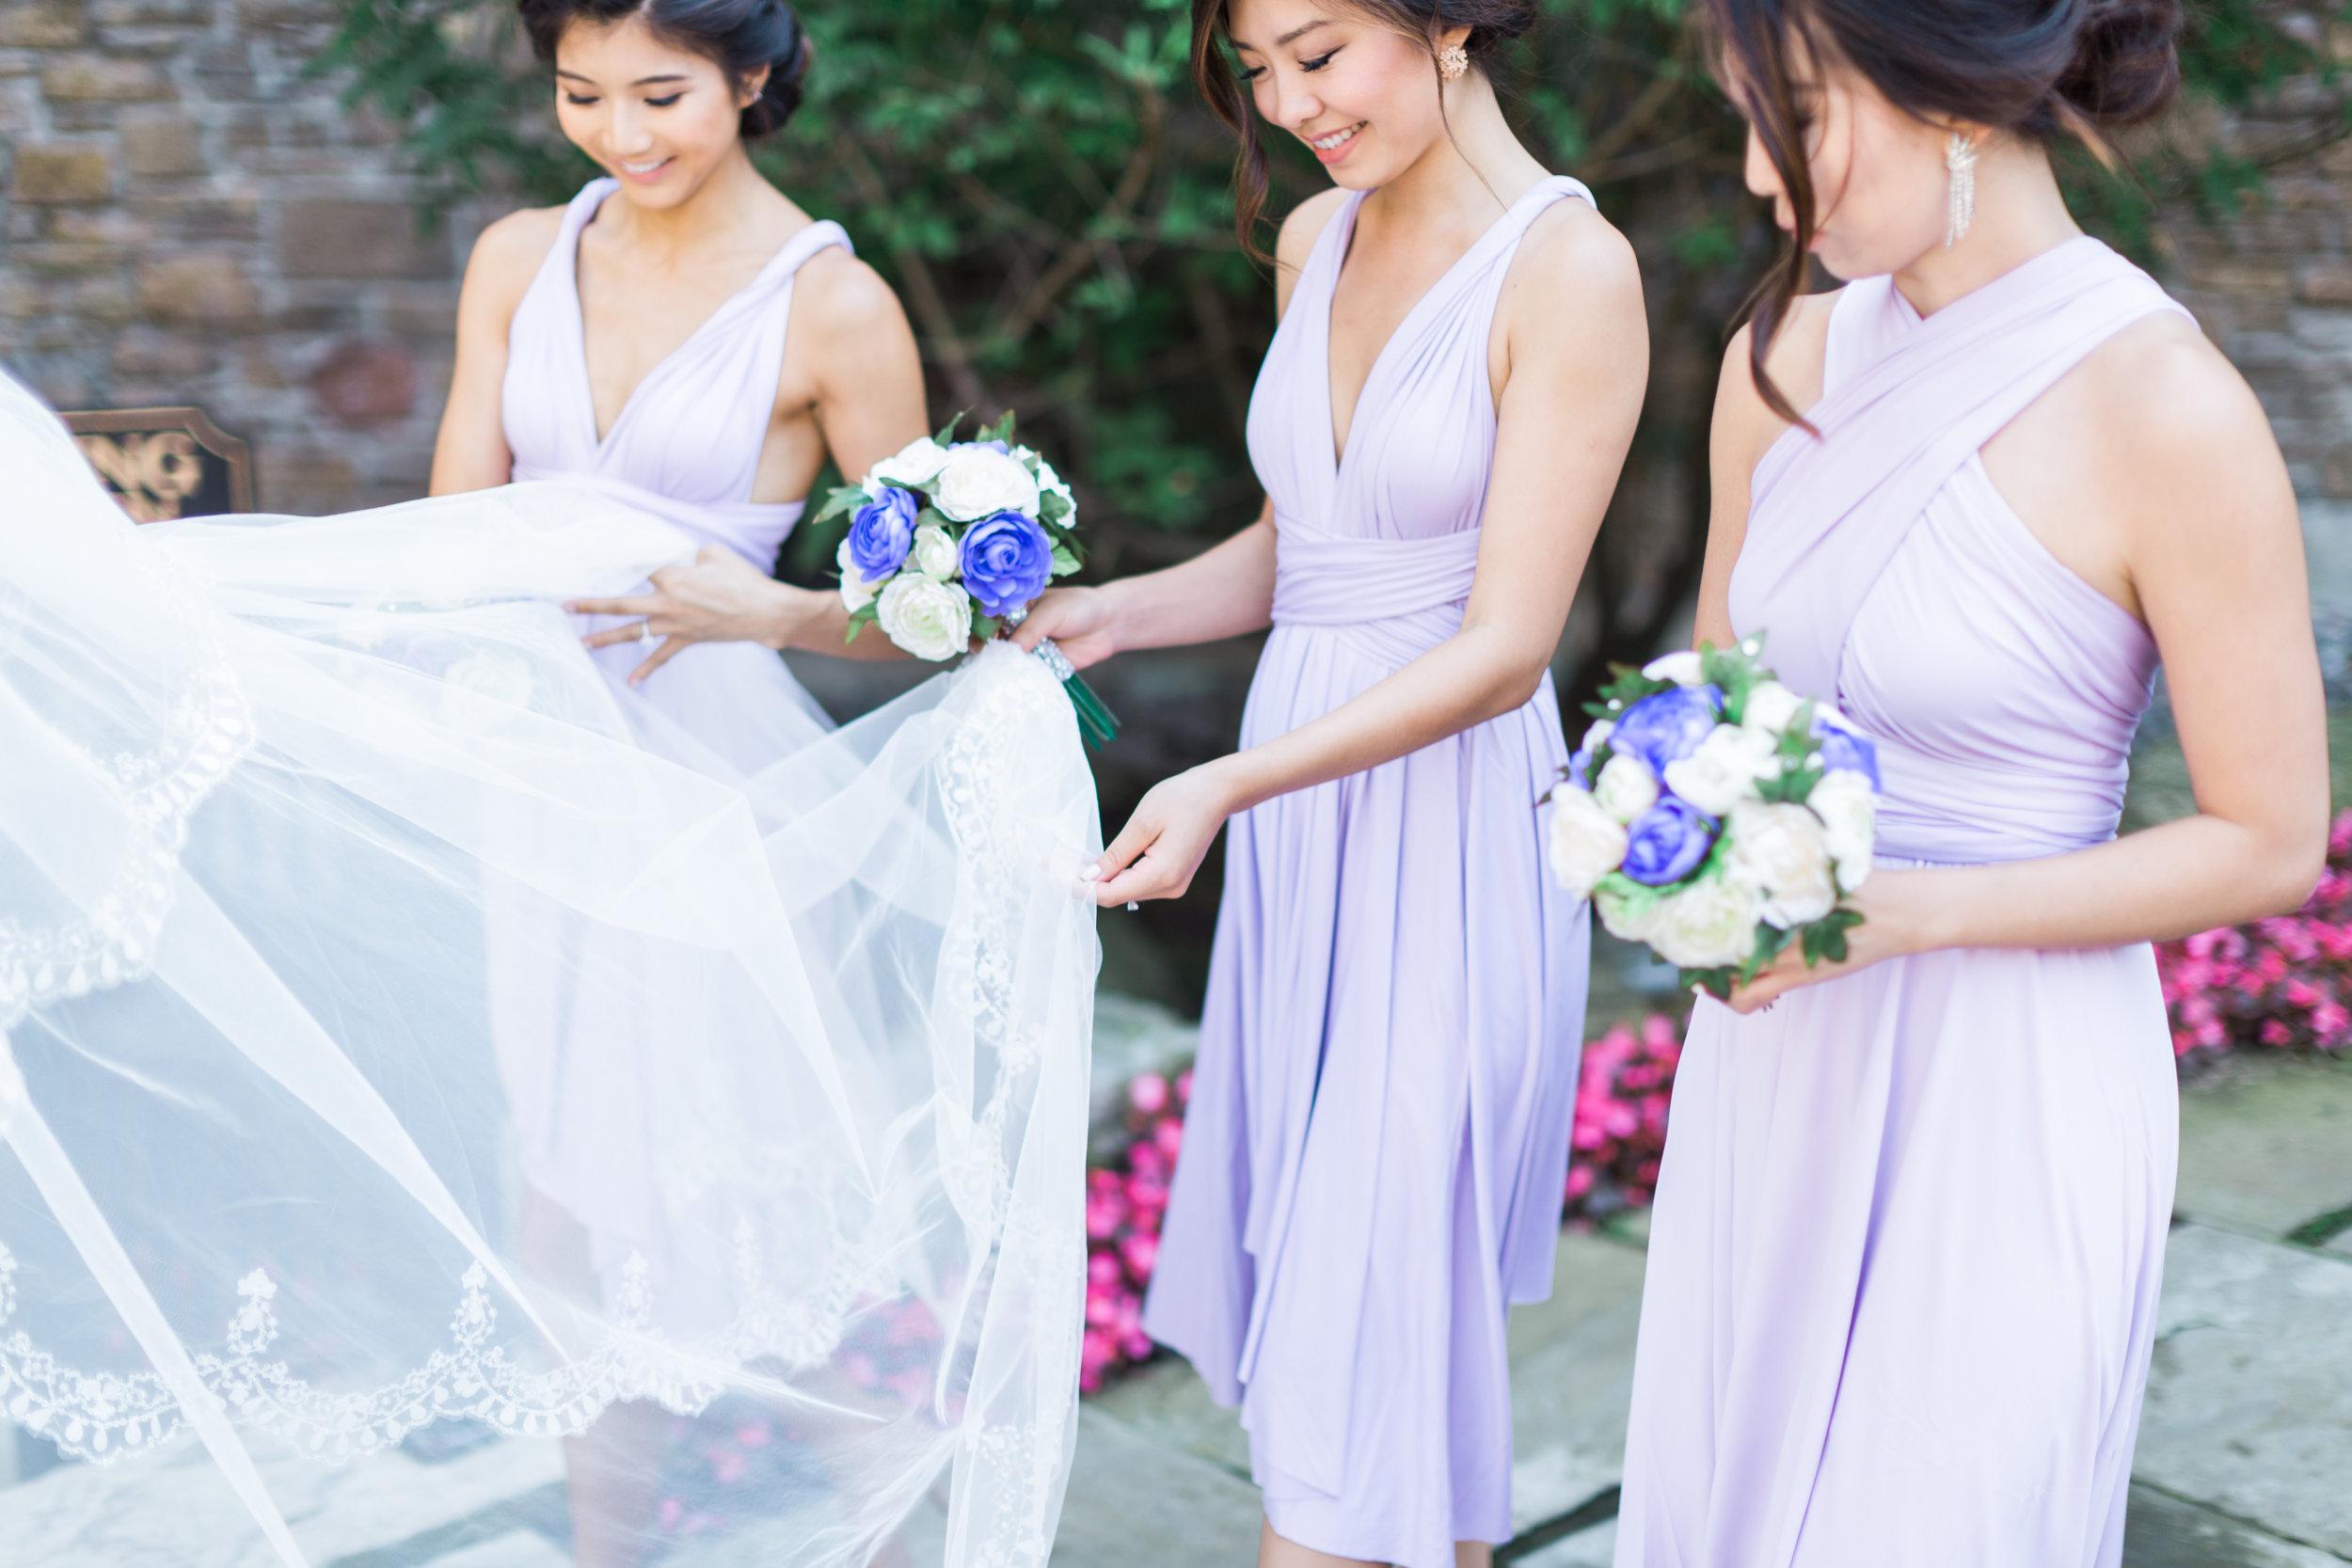 Toronto Fine Art Photographer - Old Mill Wedding - Bridesmaids Photos-16.jpg